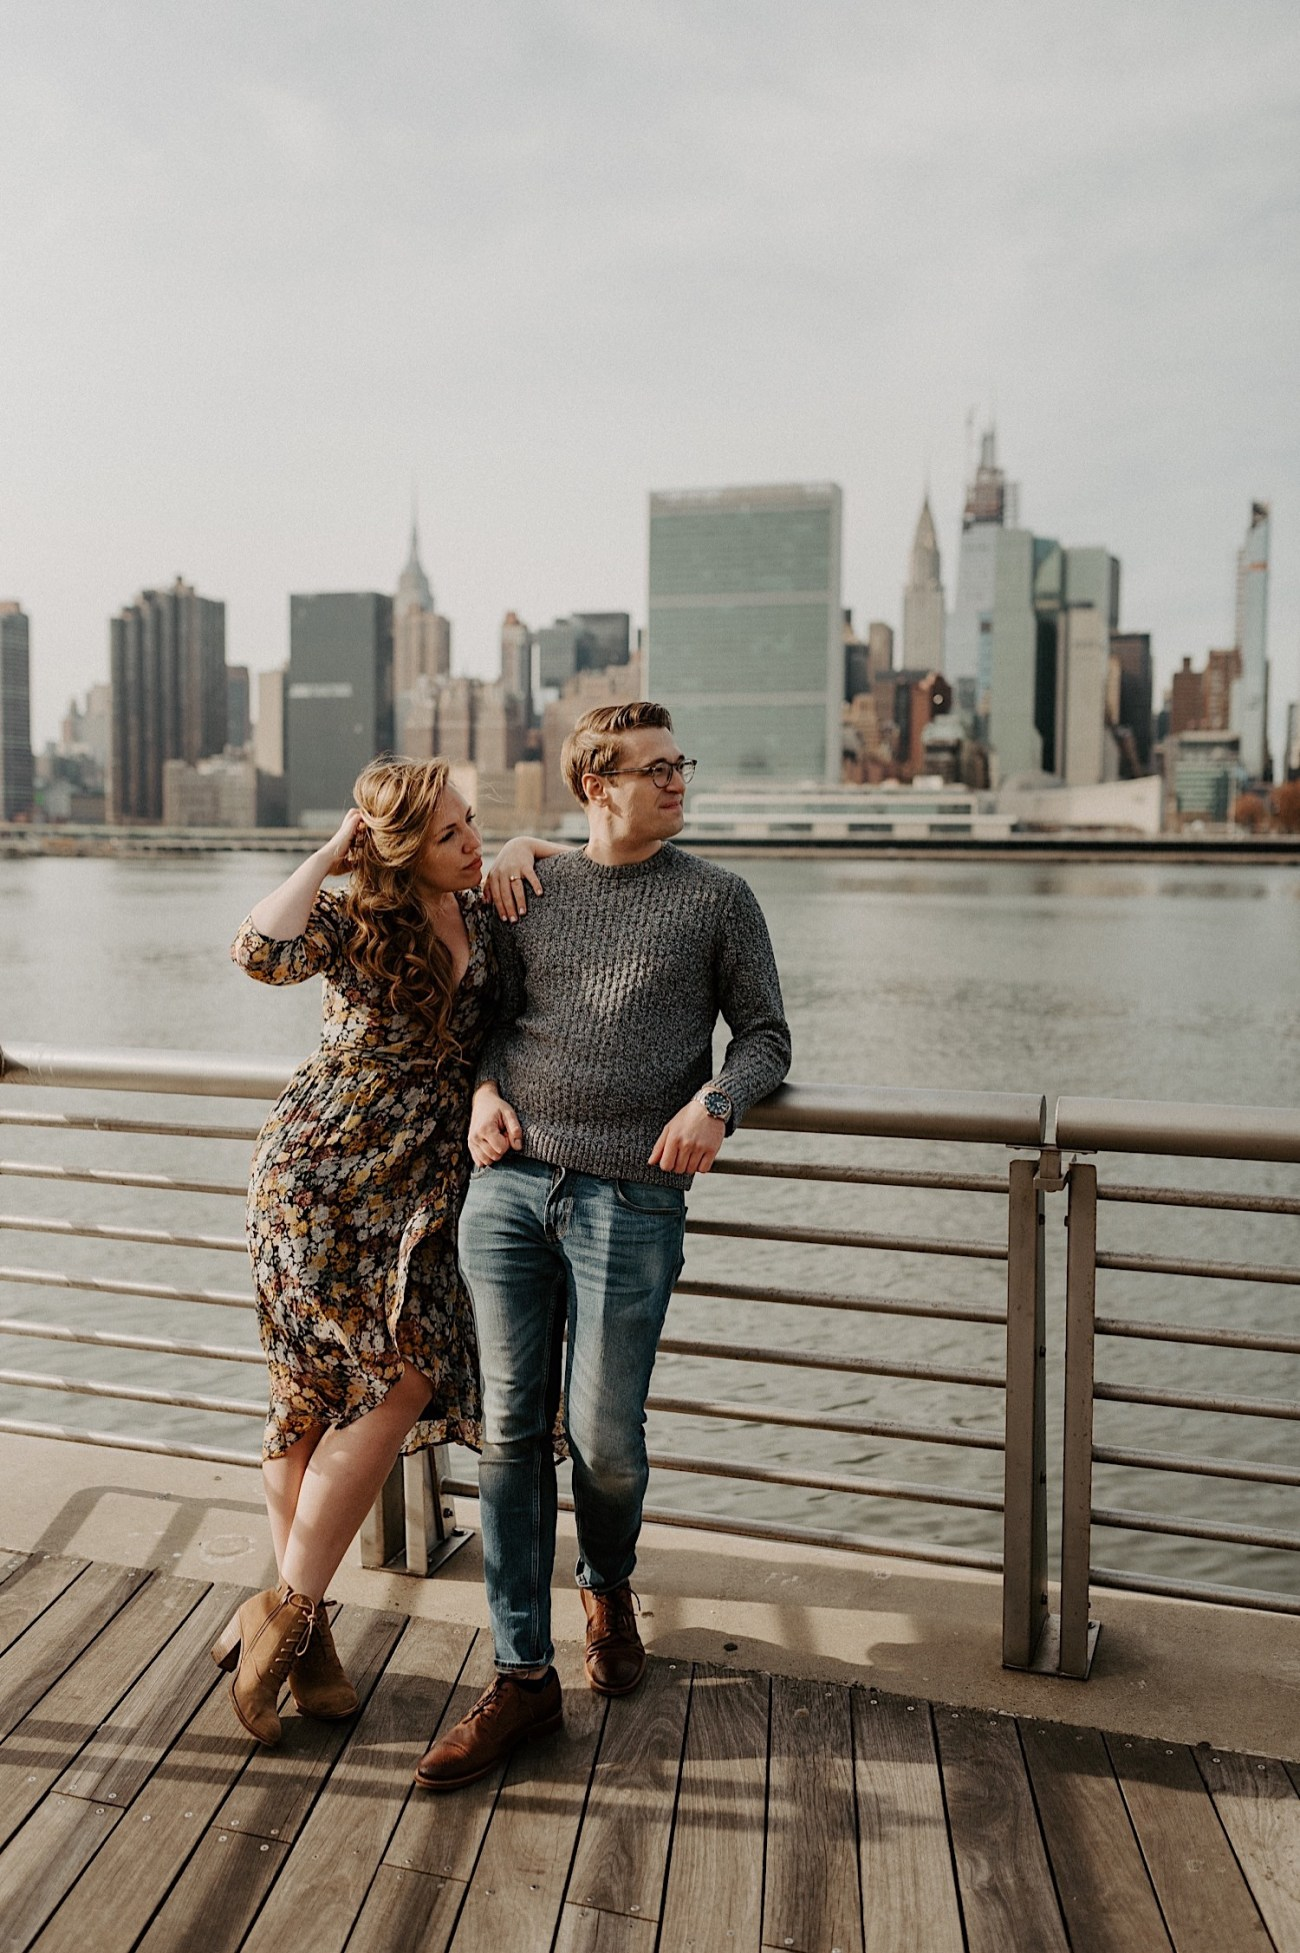 LIC Engagement Photos Pizza Engagement Photos New York Wedding Photographer LIC Boardwalk 021